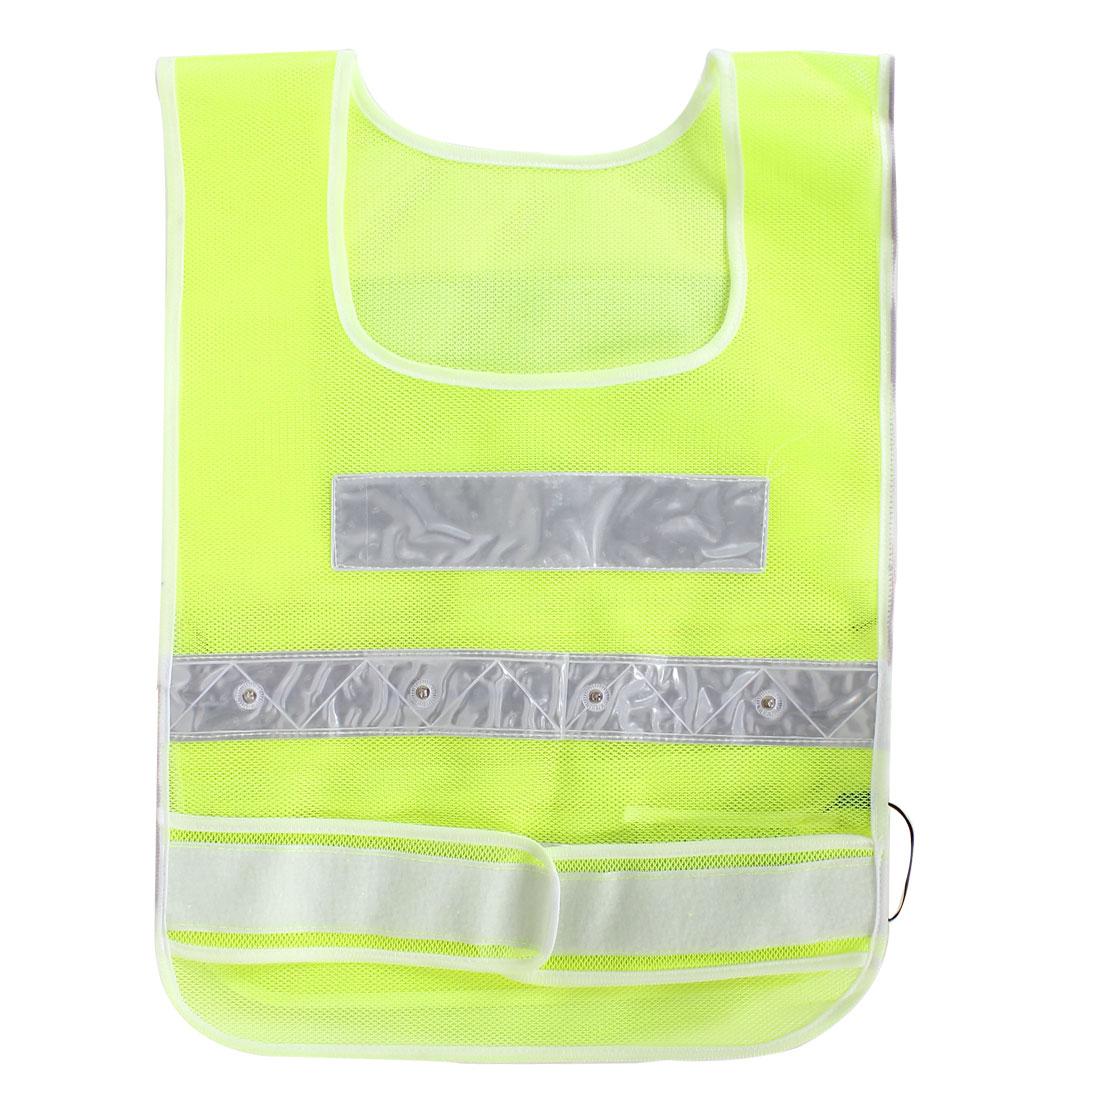 Red Illuminated Light Up Detachble Waist Straps LED Reflective Safety Vest